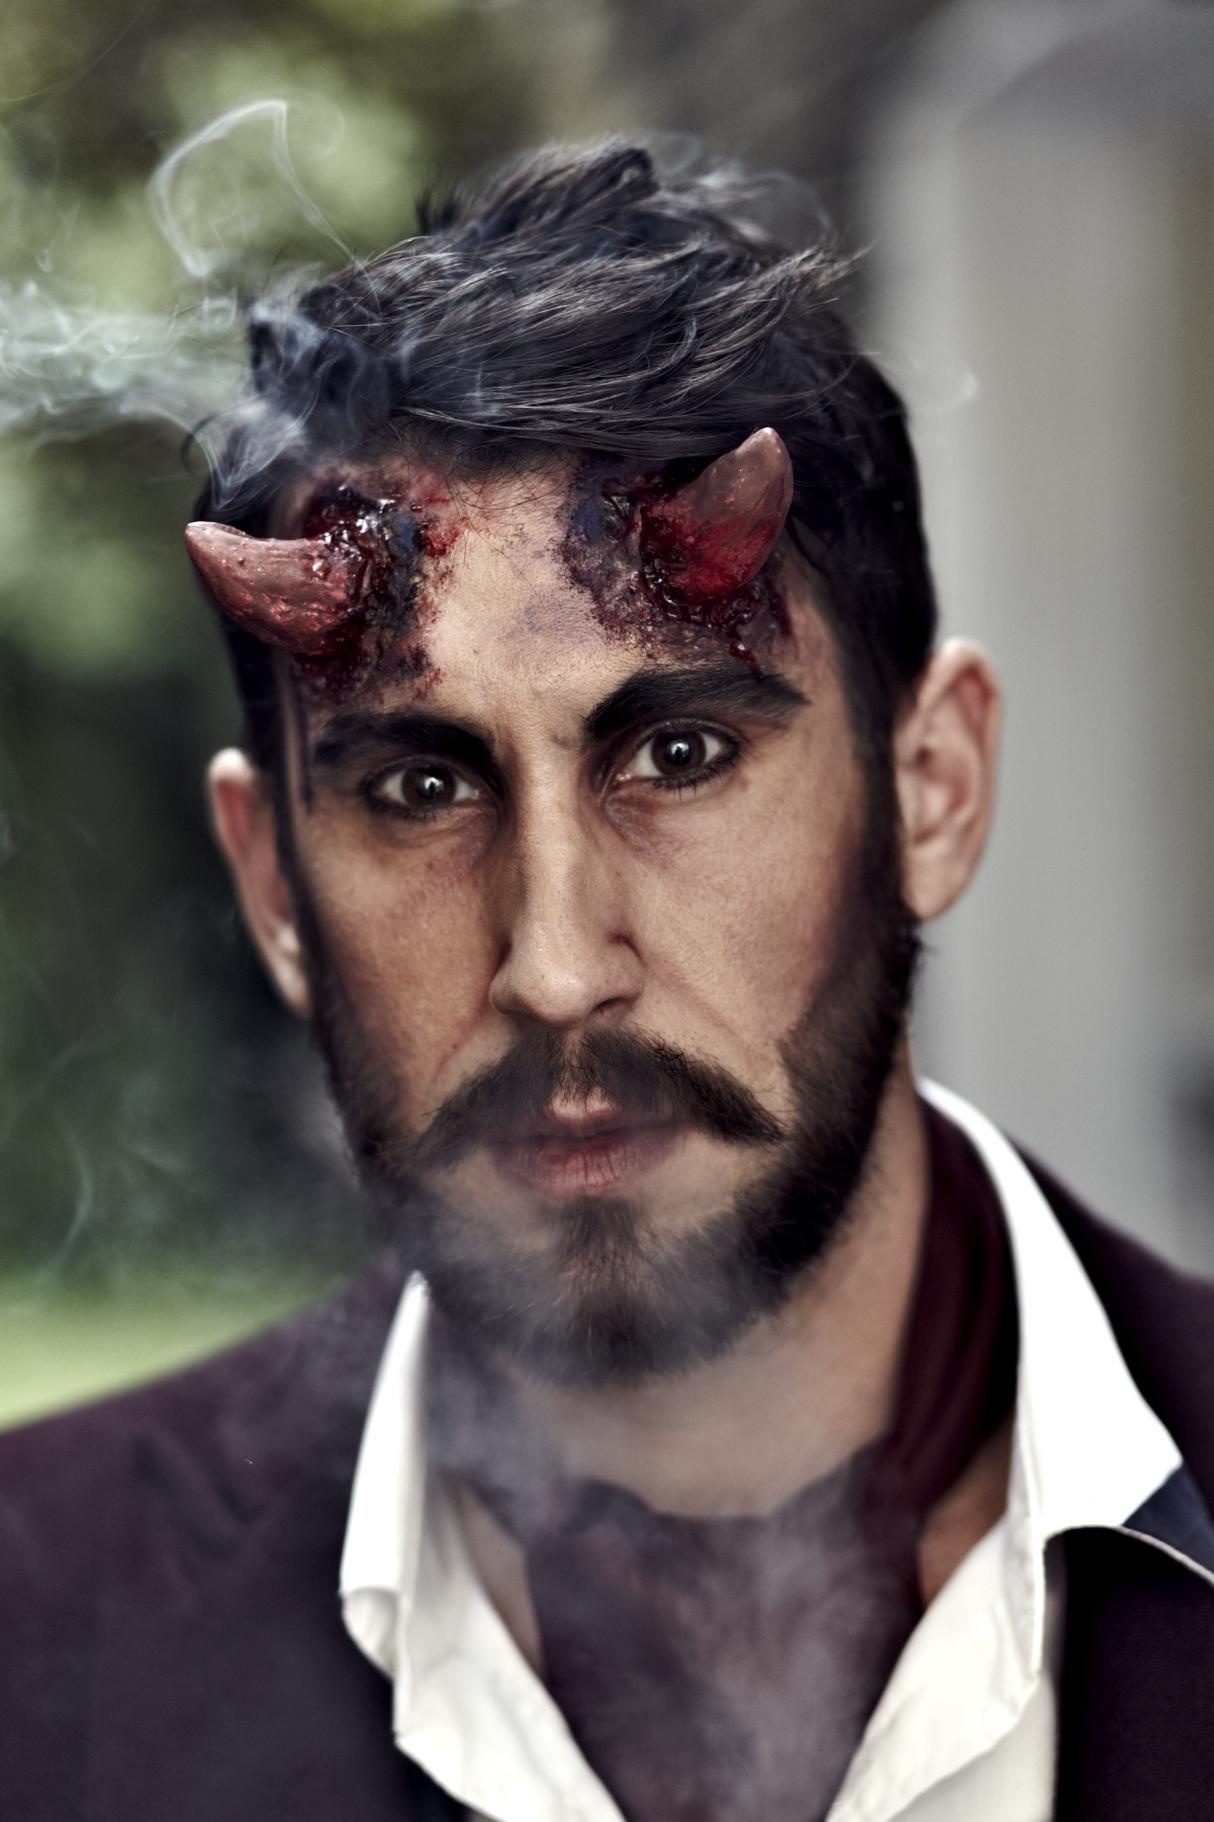 Devil smoking